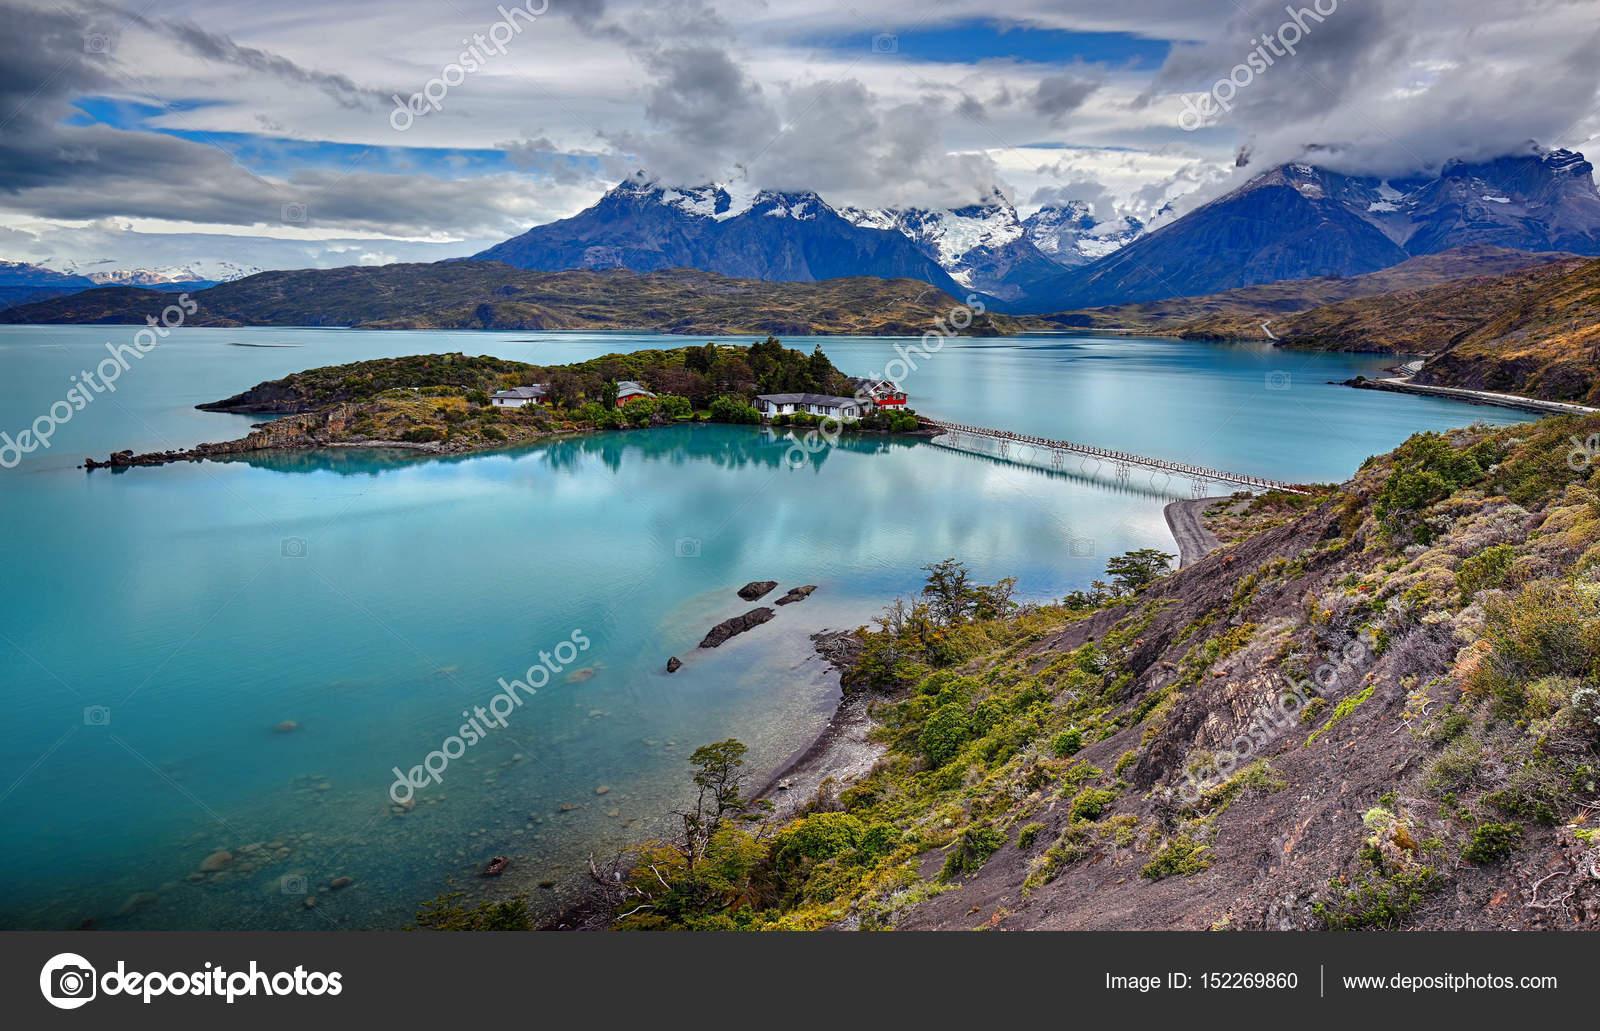 Lake Pehoe at Torres del Paine N P  (Patagonia, Chile